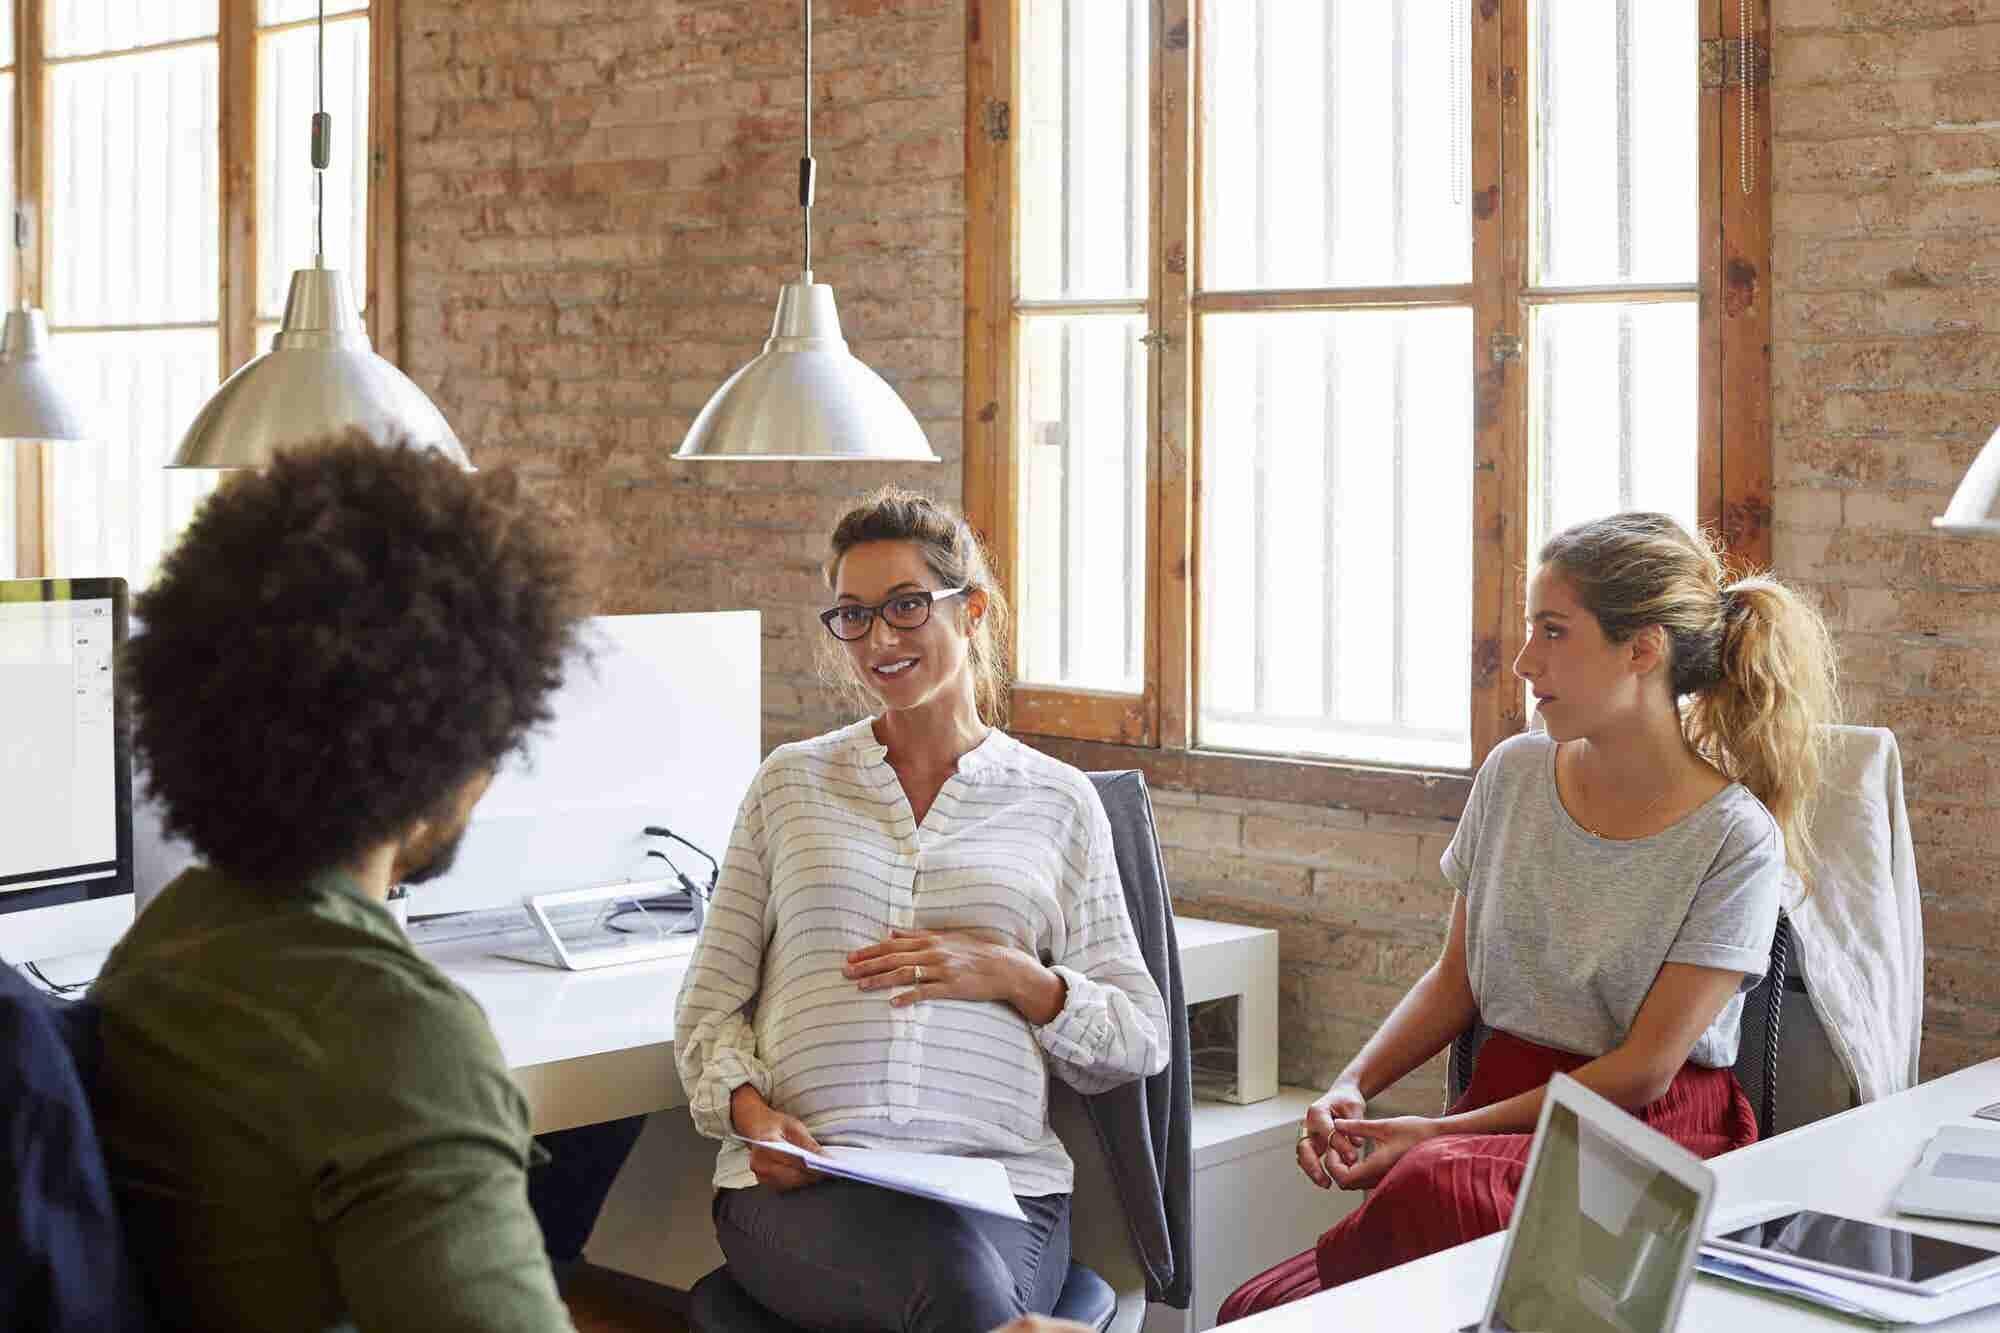 7 Companies That Offer Fertility Benefits